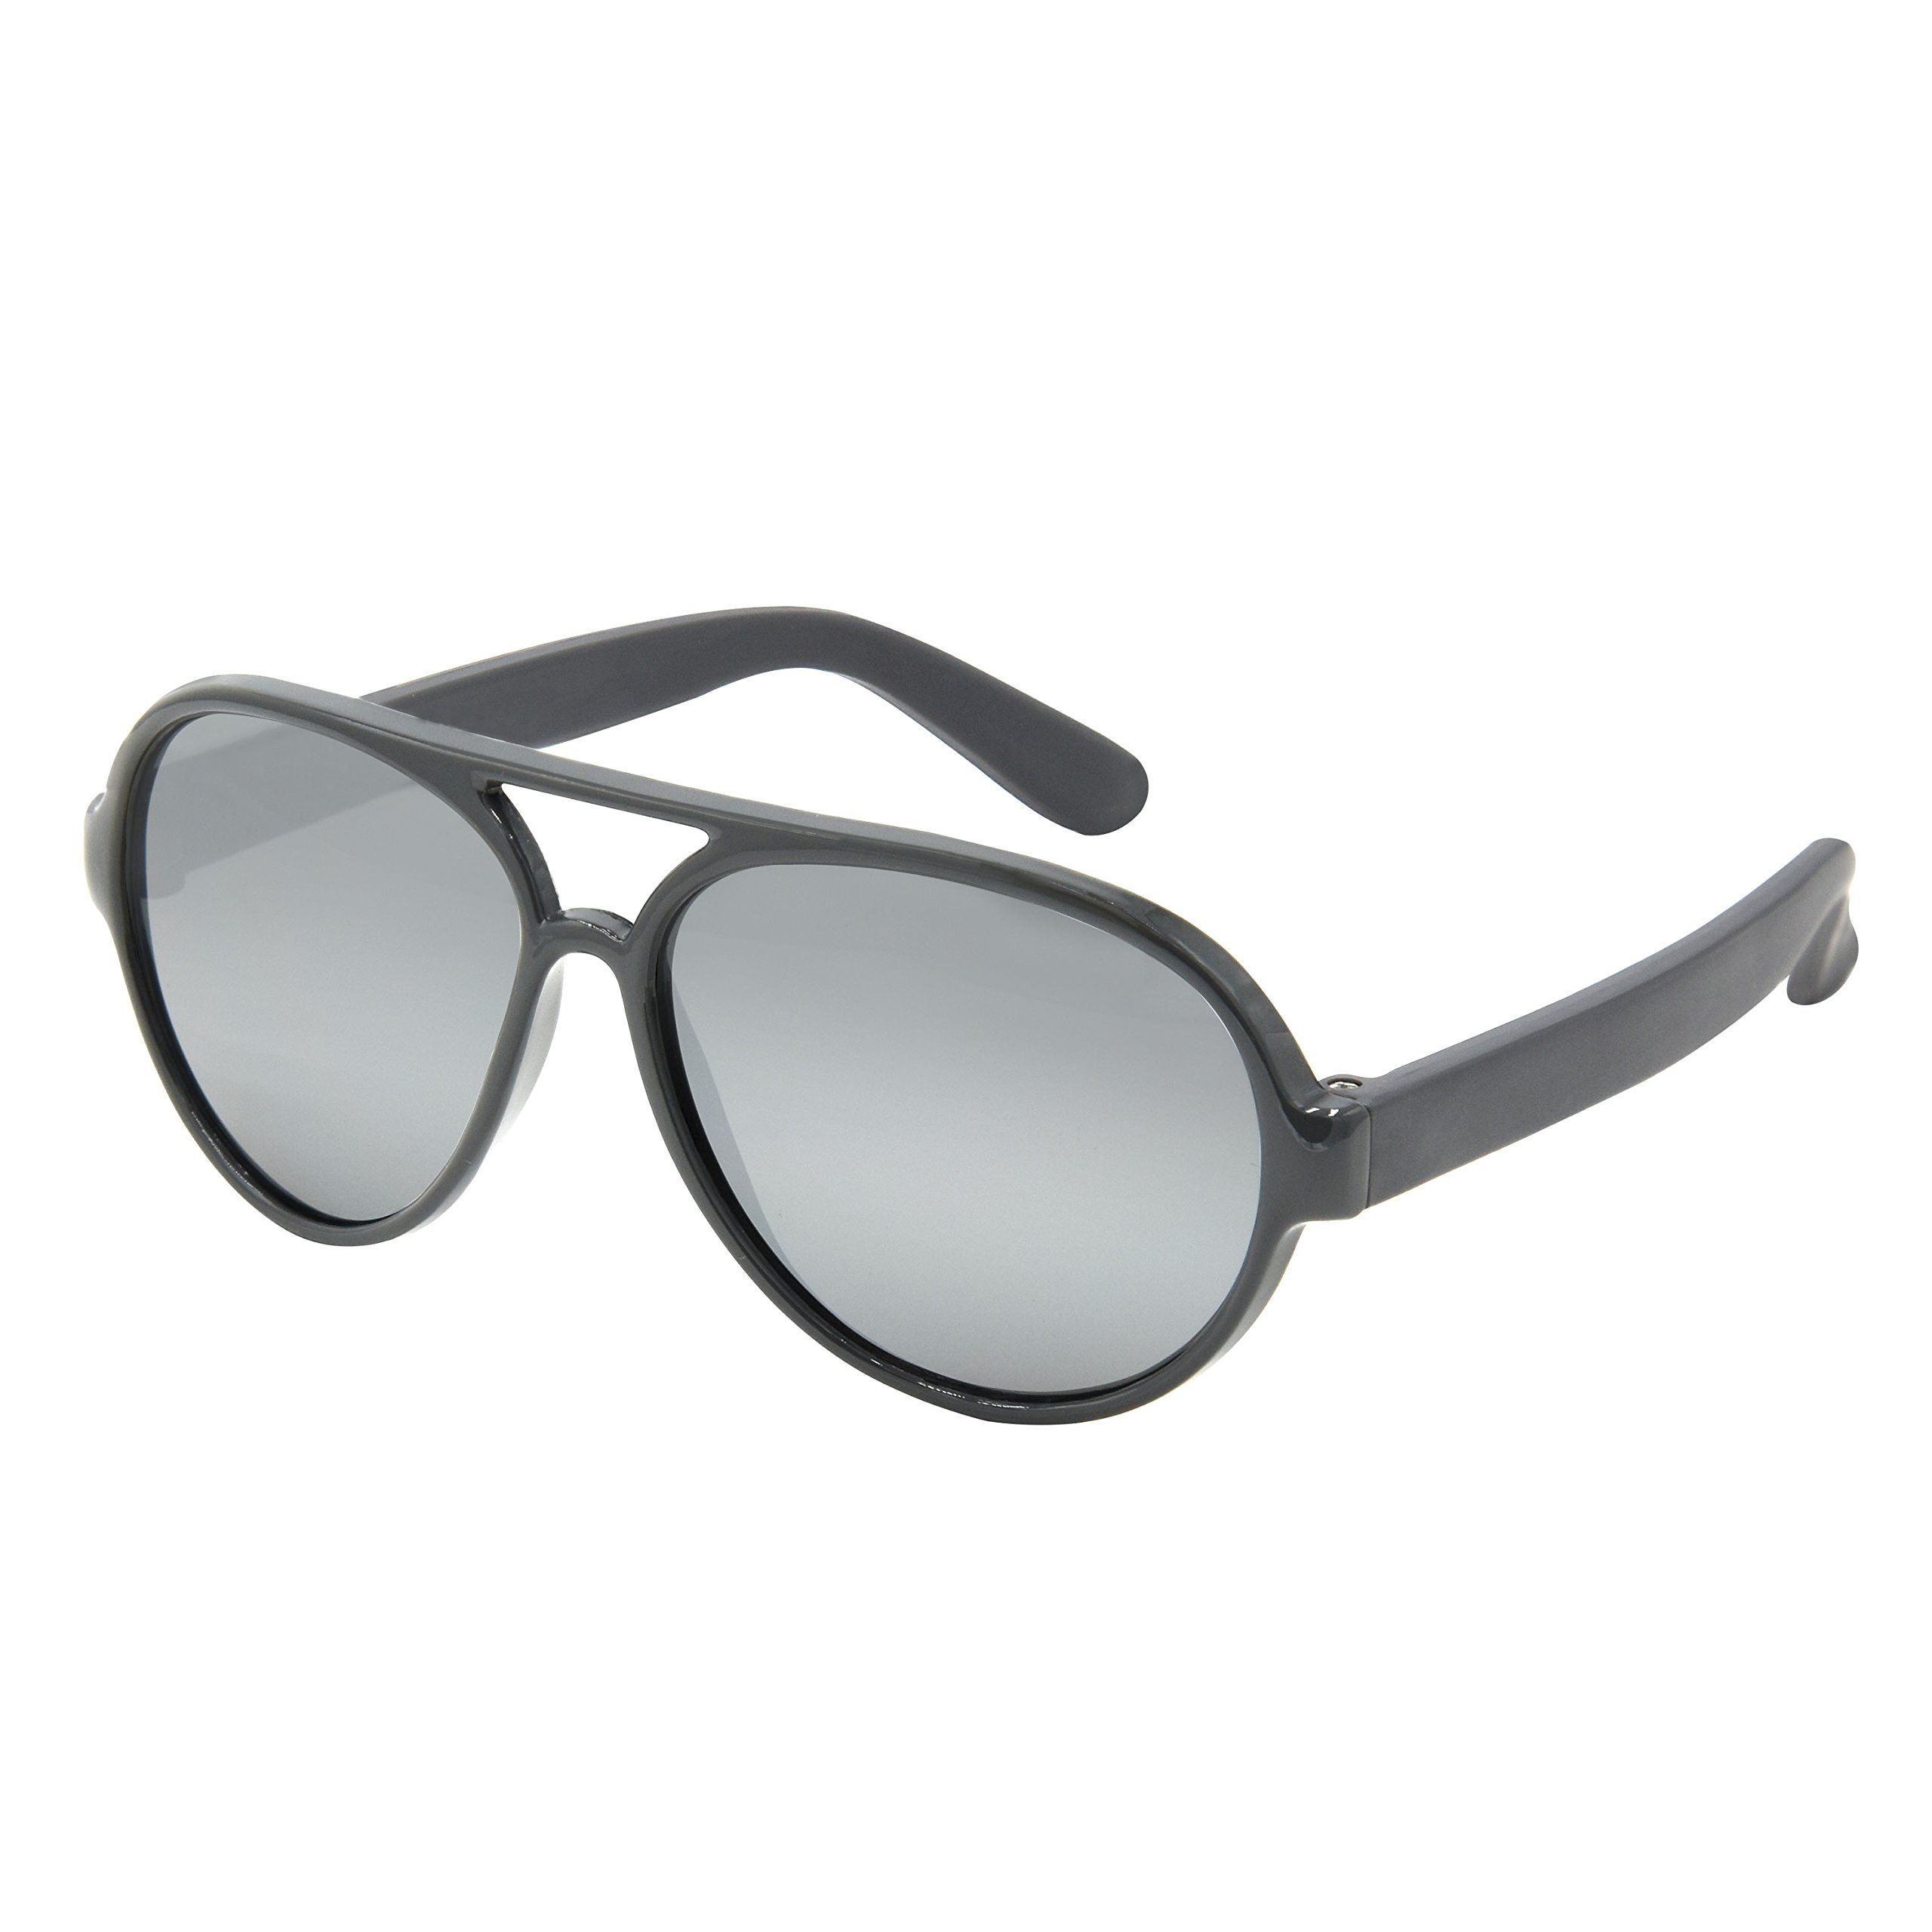 Carters Protected Sunglasses Aviator Toddler